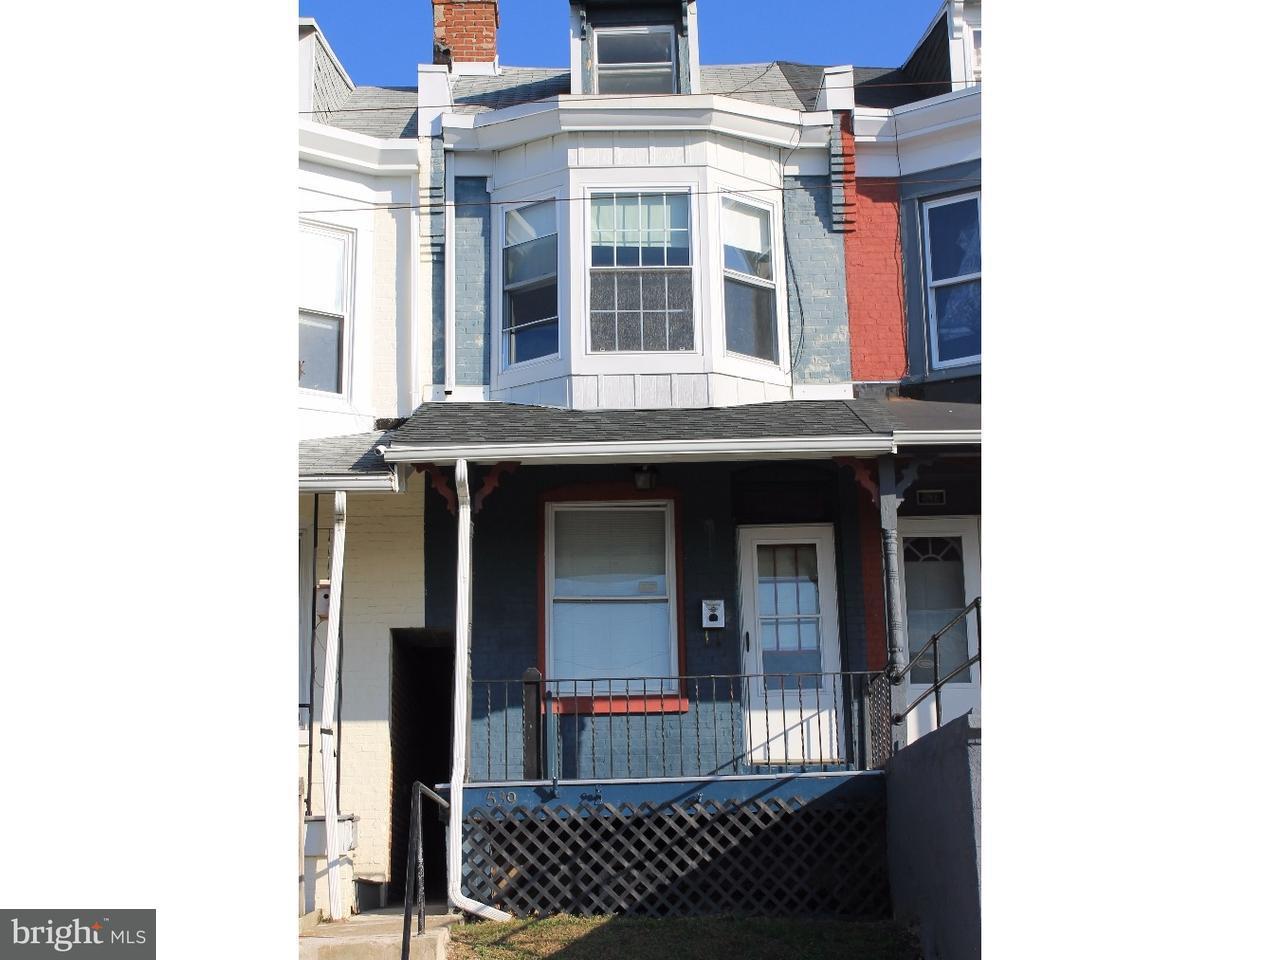 Casa unifamiliar adosada (Townhouse) por un Venta en 539 LINDEN Street Reading, Pennsylvania 19604 Estados Unidos